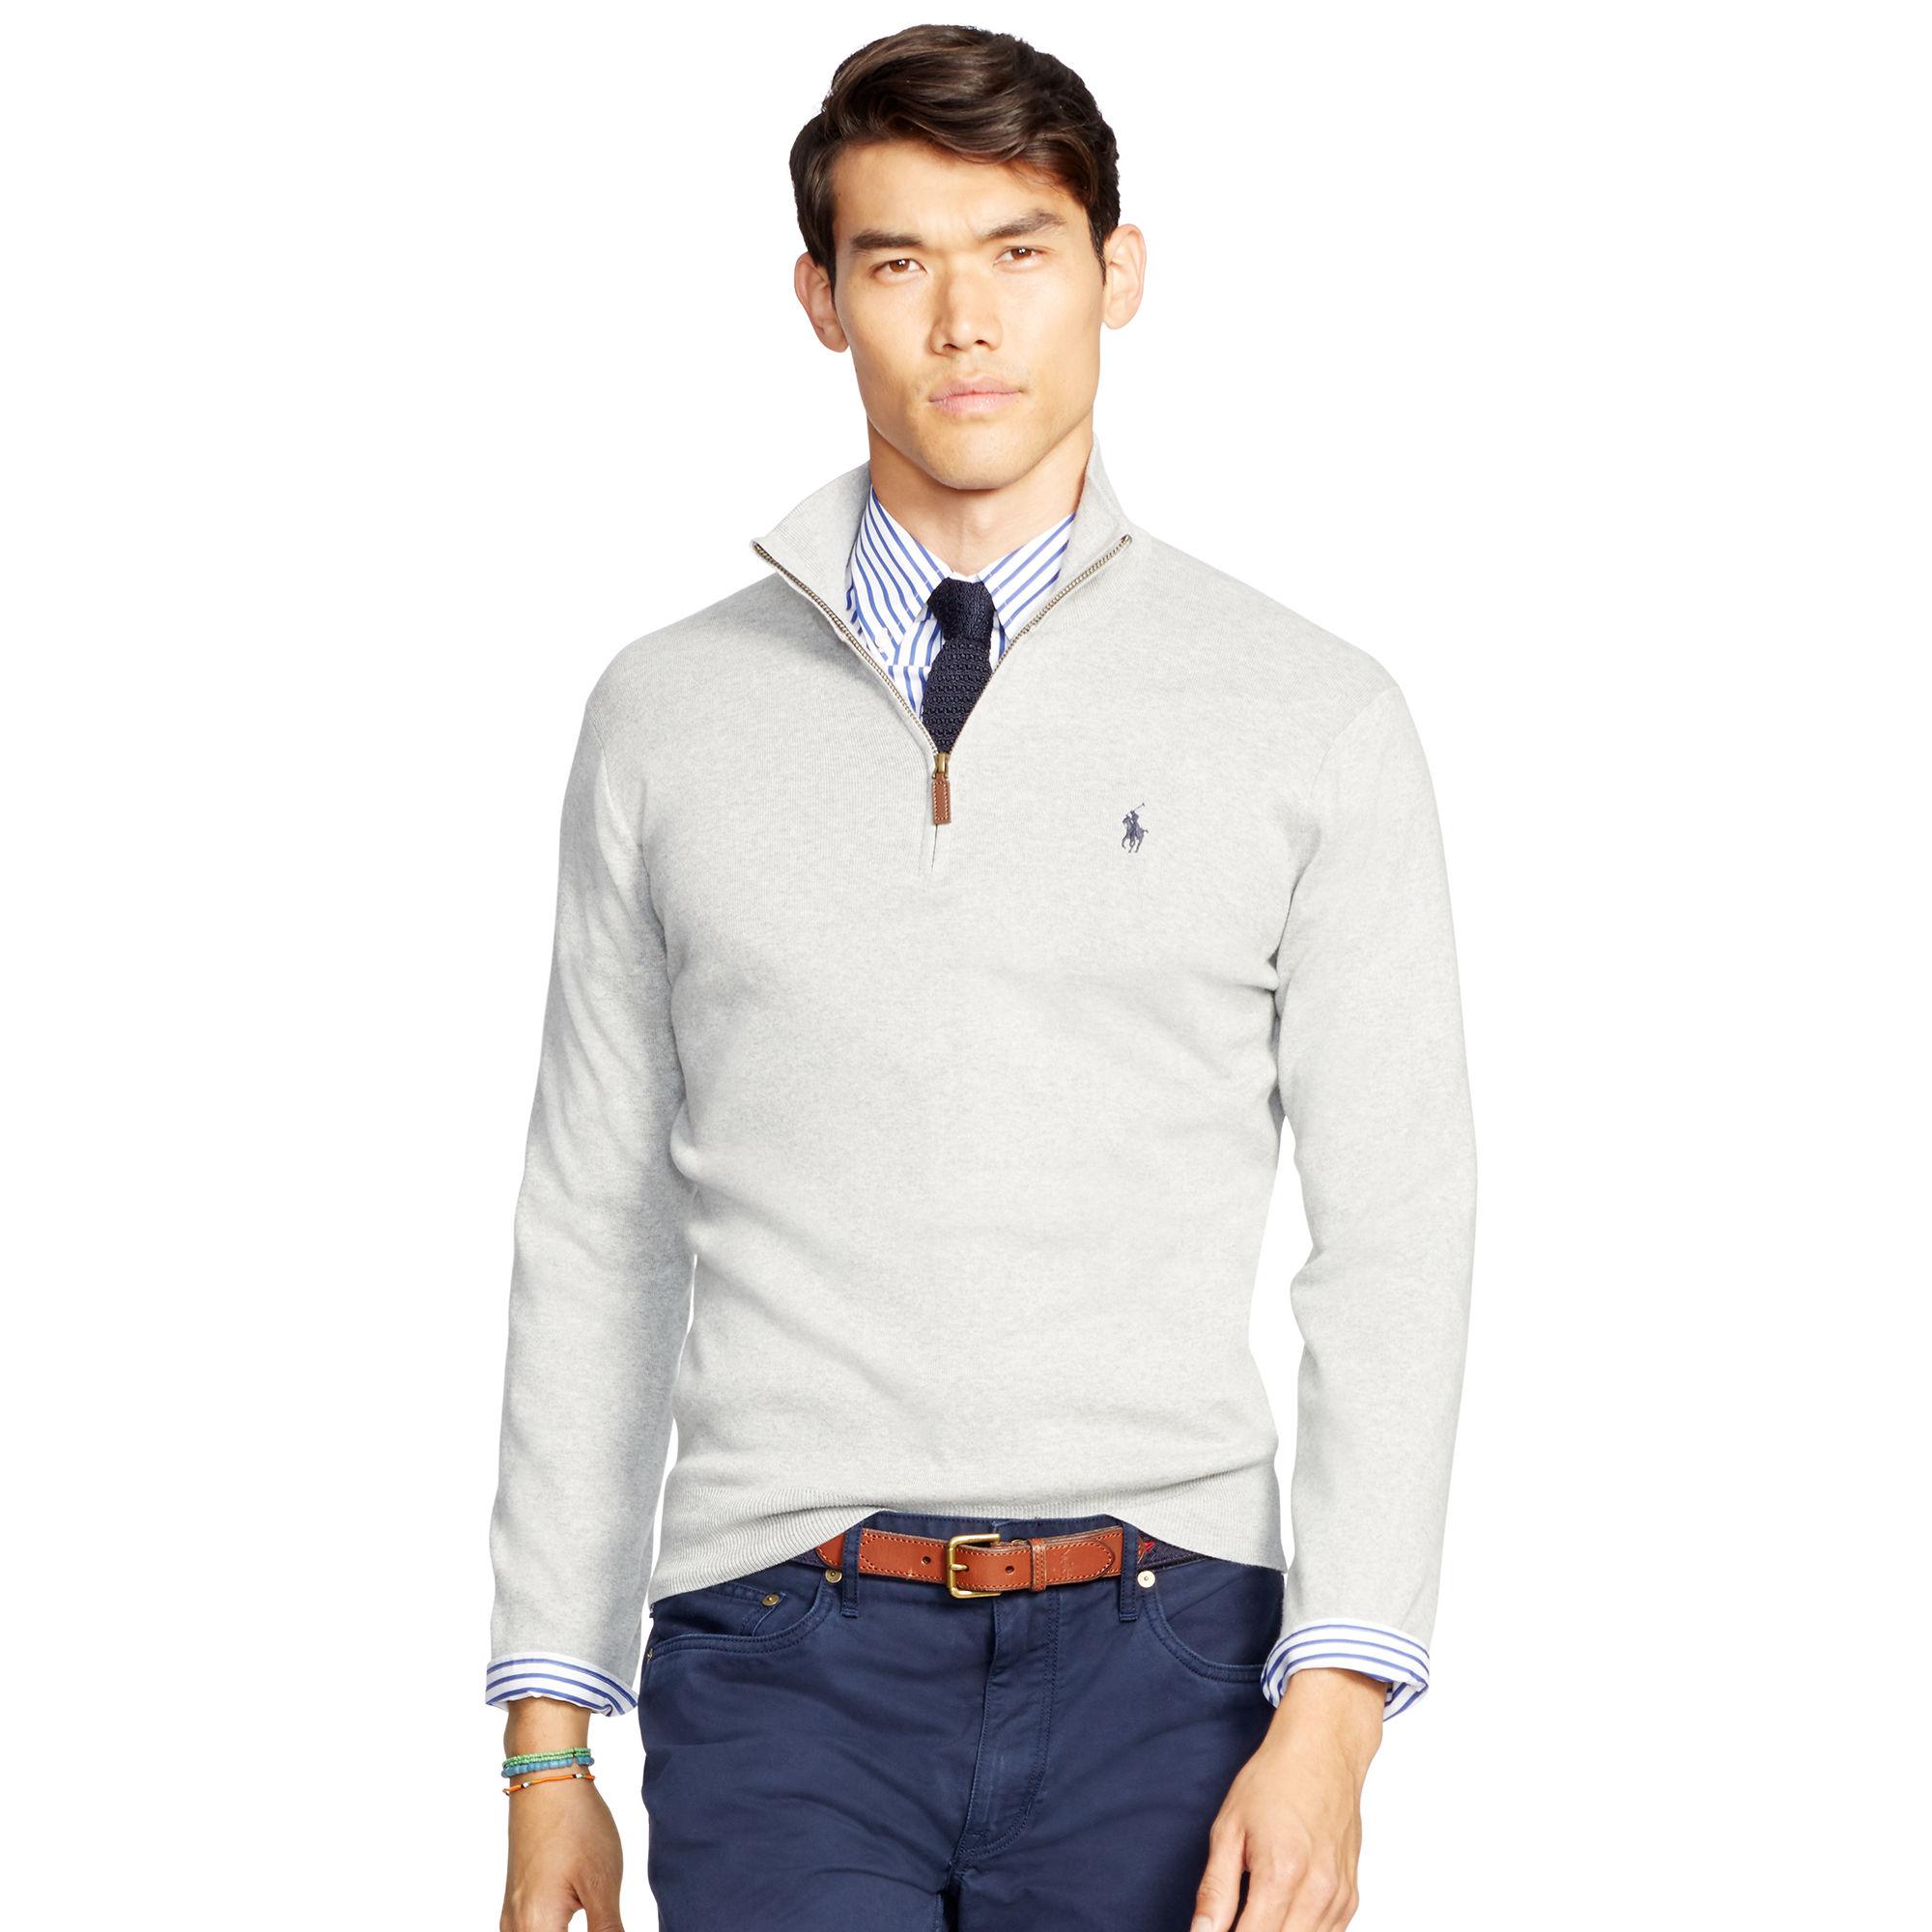 1a62dc6b4 Polo Ralph Lauren Pima Cotton Half-zip Sweater in Gray for Men - Lyst